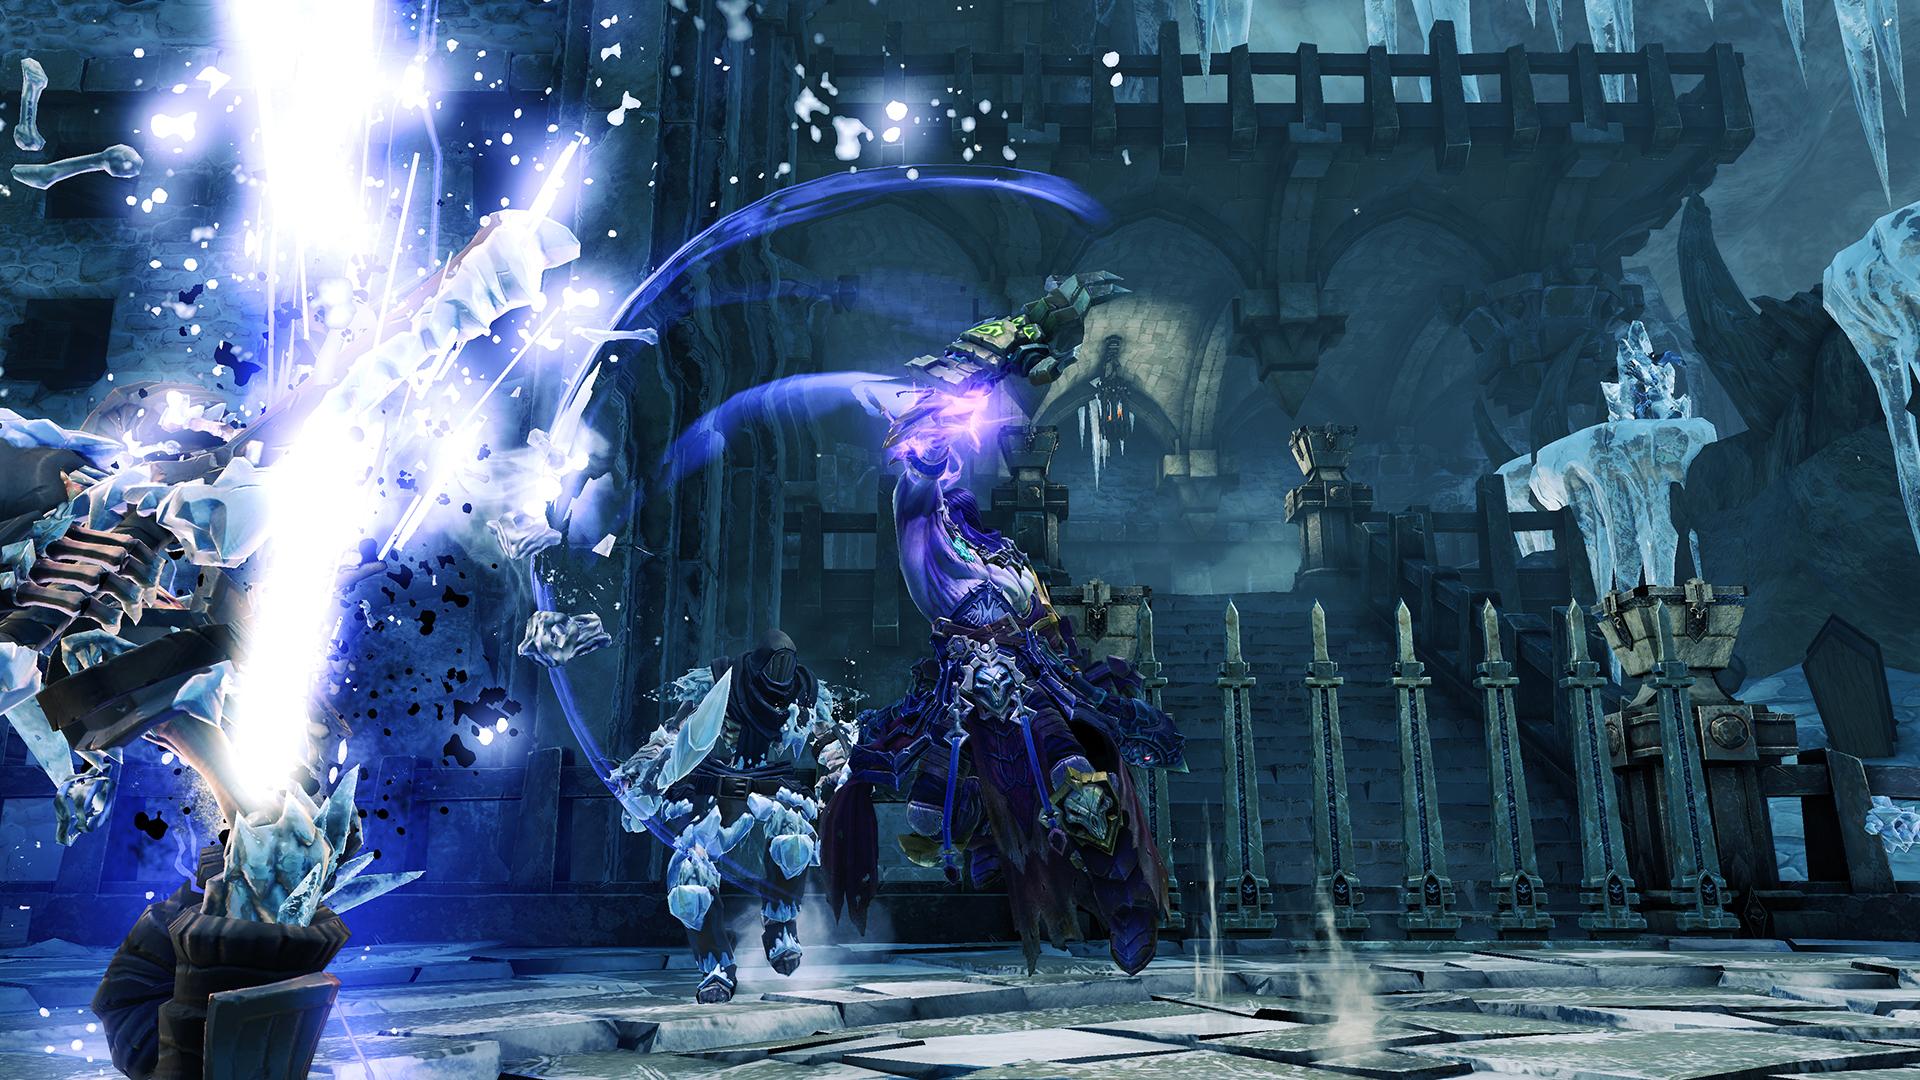 Darksiders II: Deathinitive Edition screenshot 3